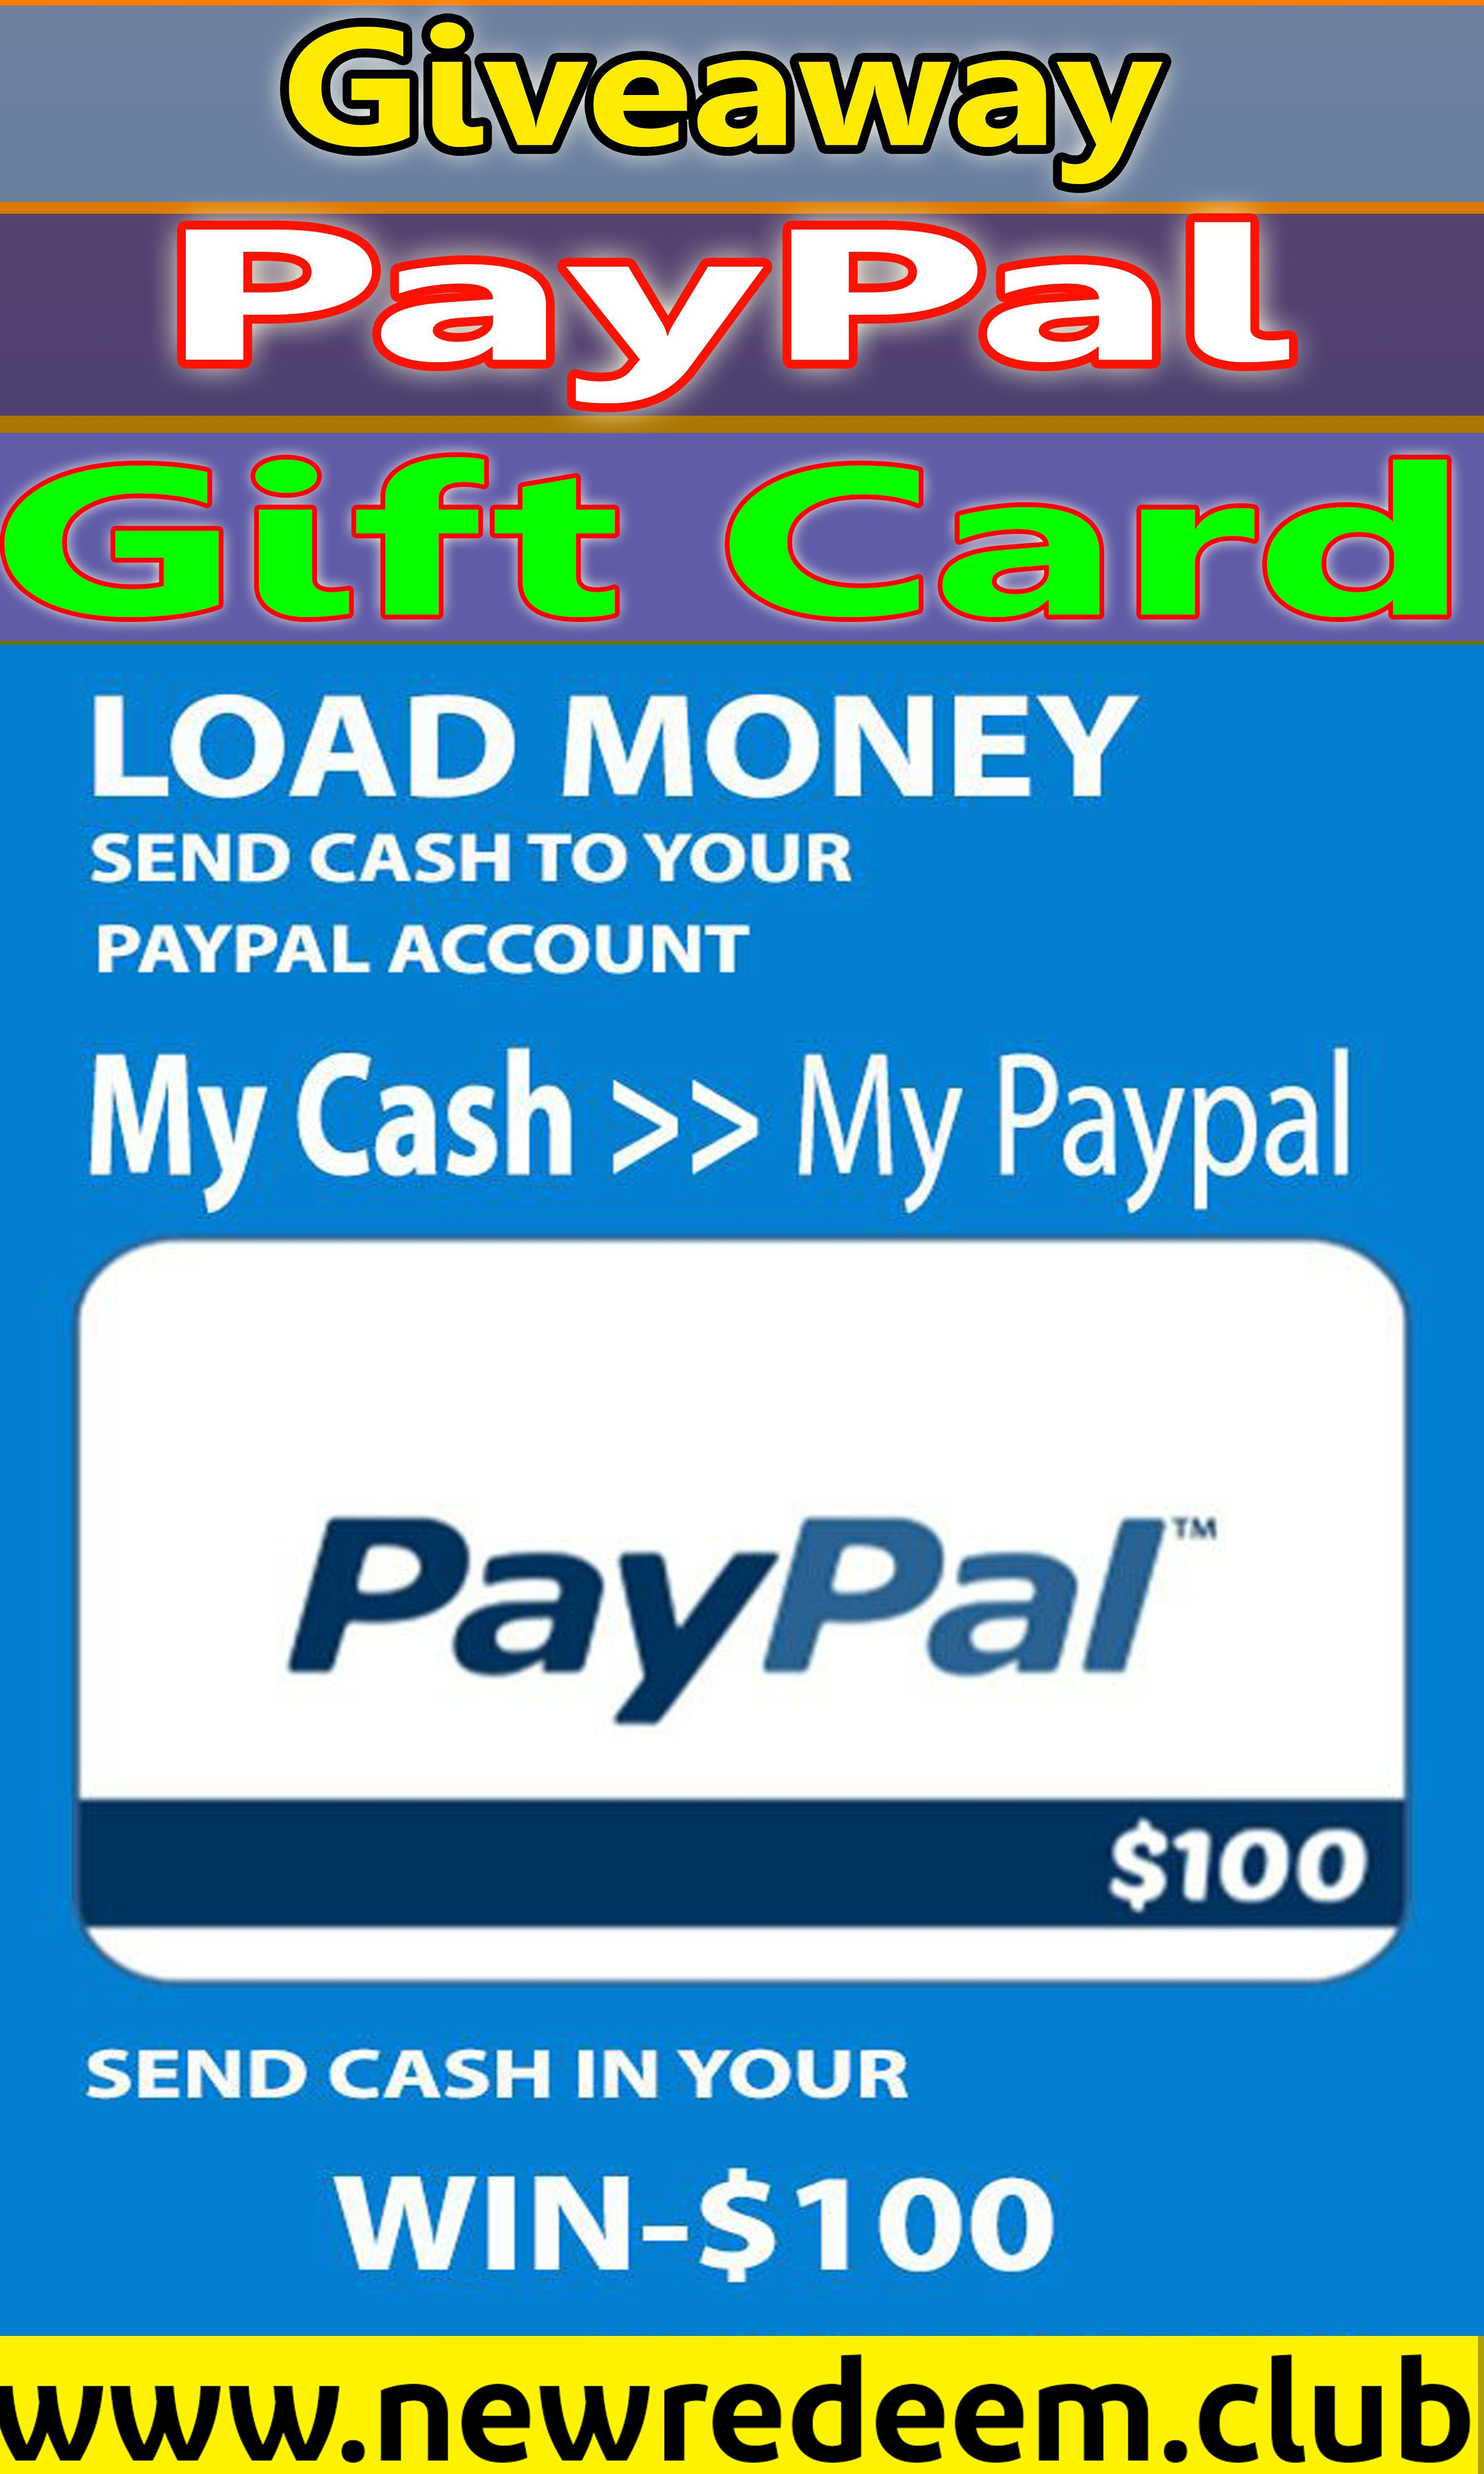 Free paypal gift card unused codes generator 2020 in 2020